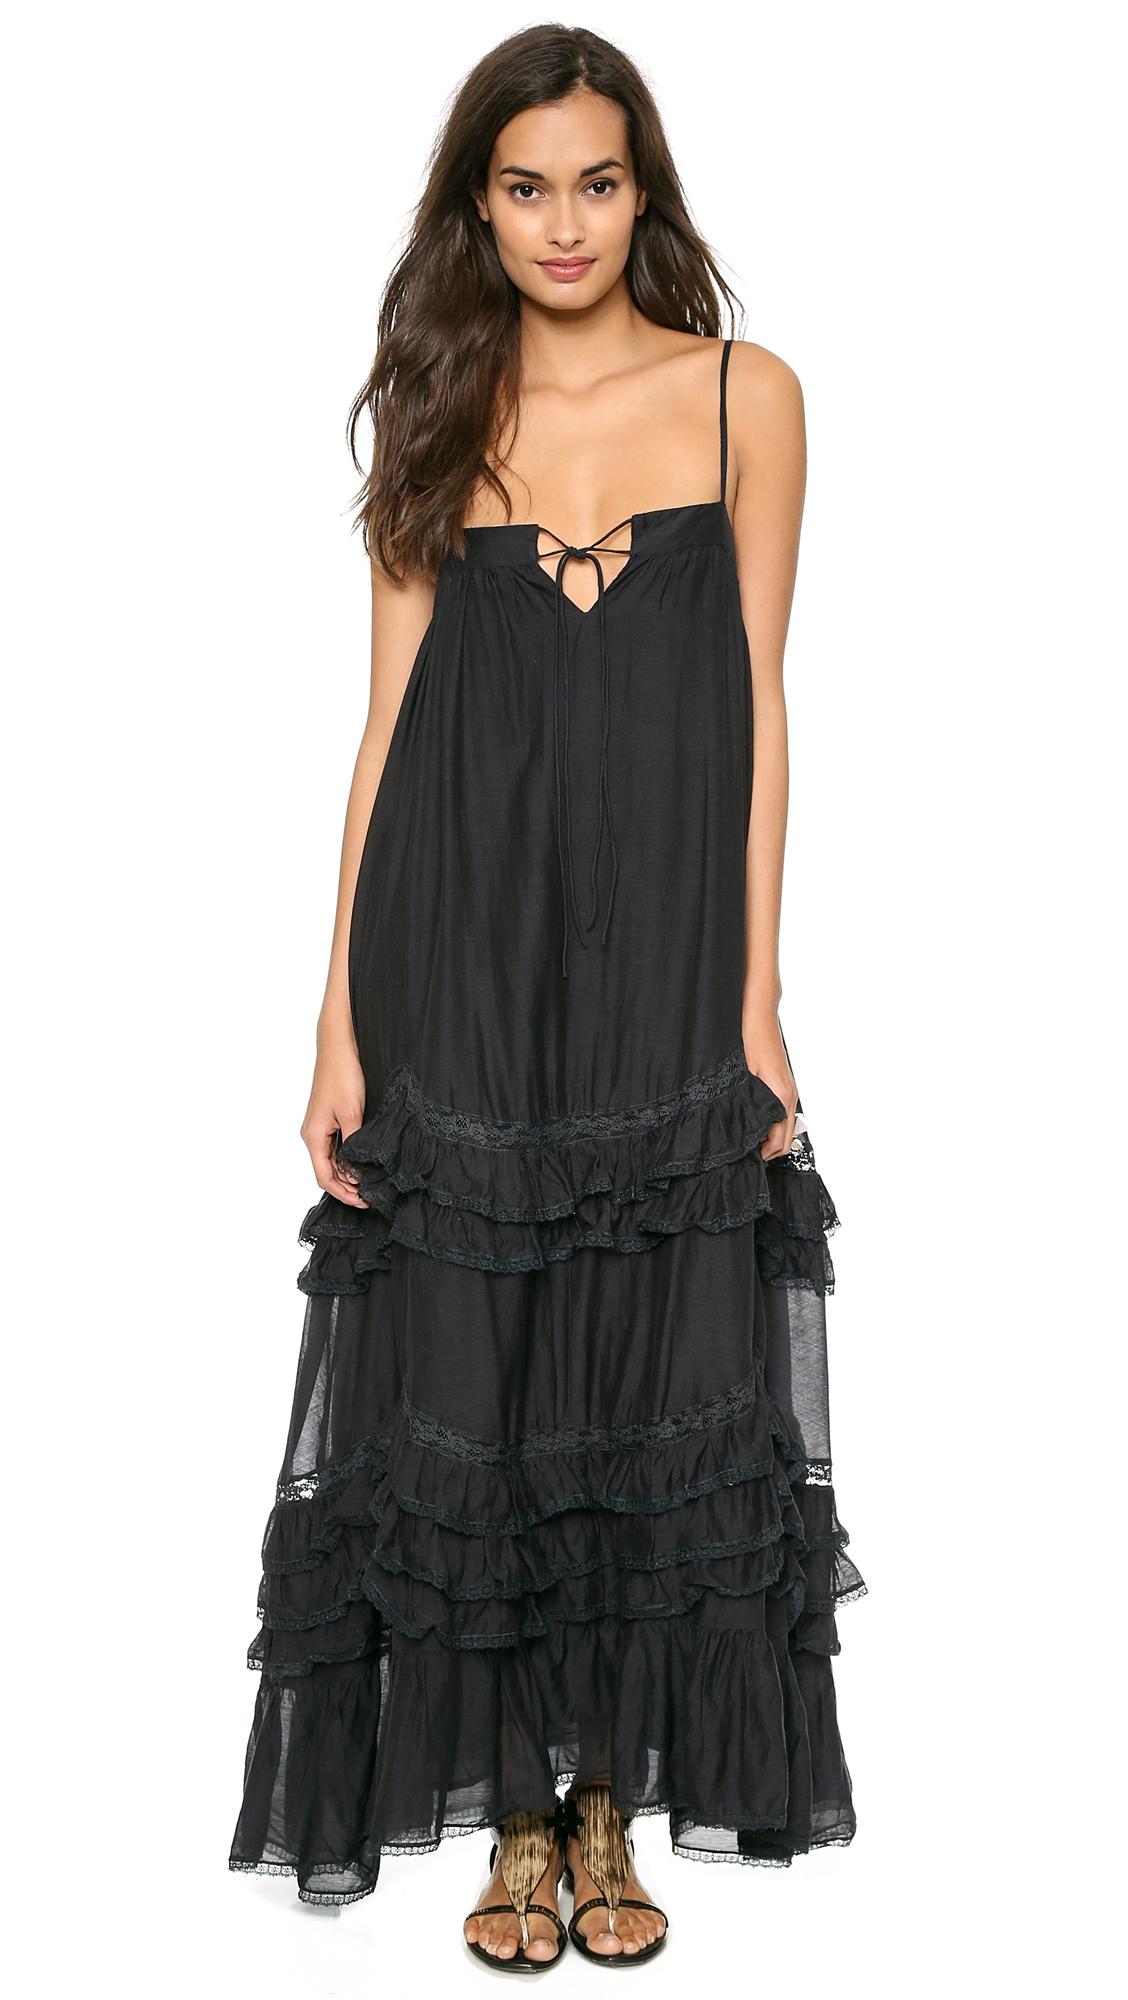 Mes Demoiselles Delicate Ruffle Maxi Dress Black In Black